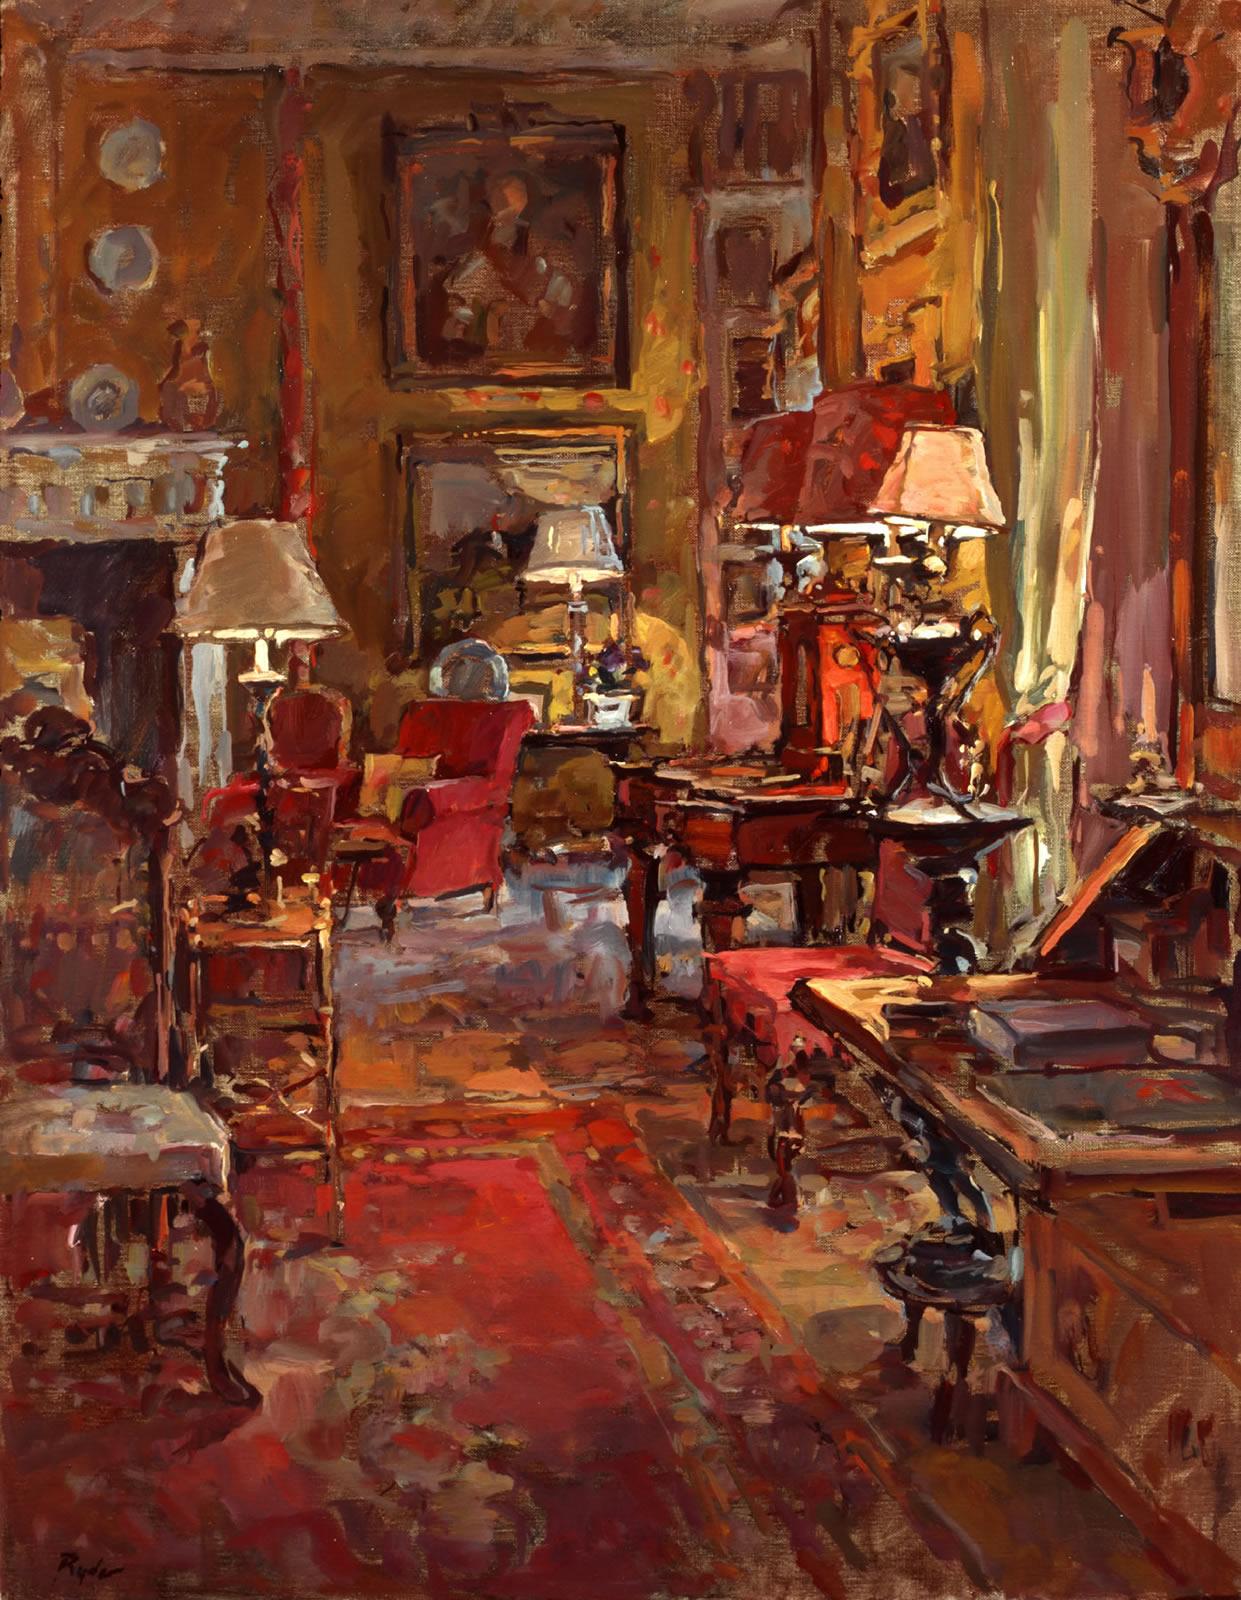 Susan Ryder Rp Neac Artist And Painter Interiors And Exteriors